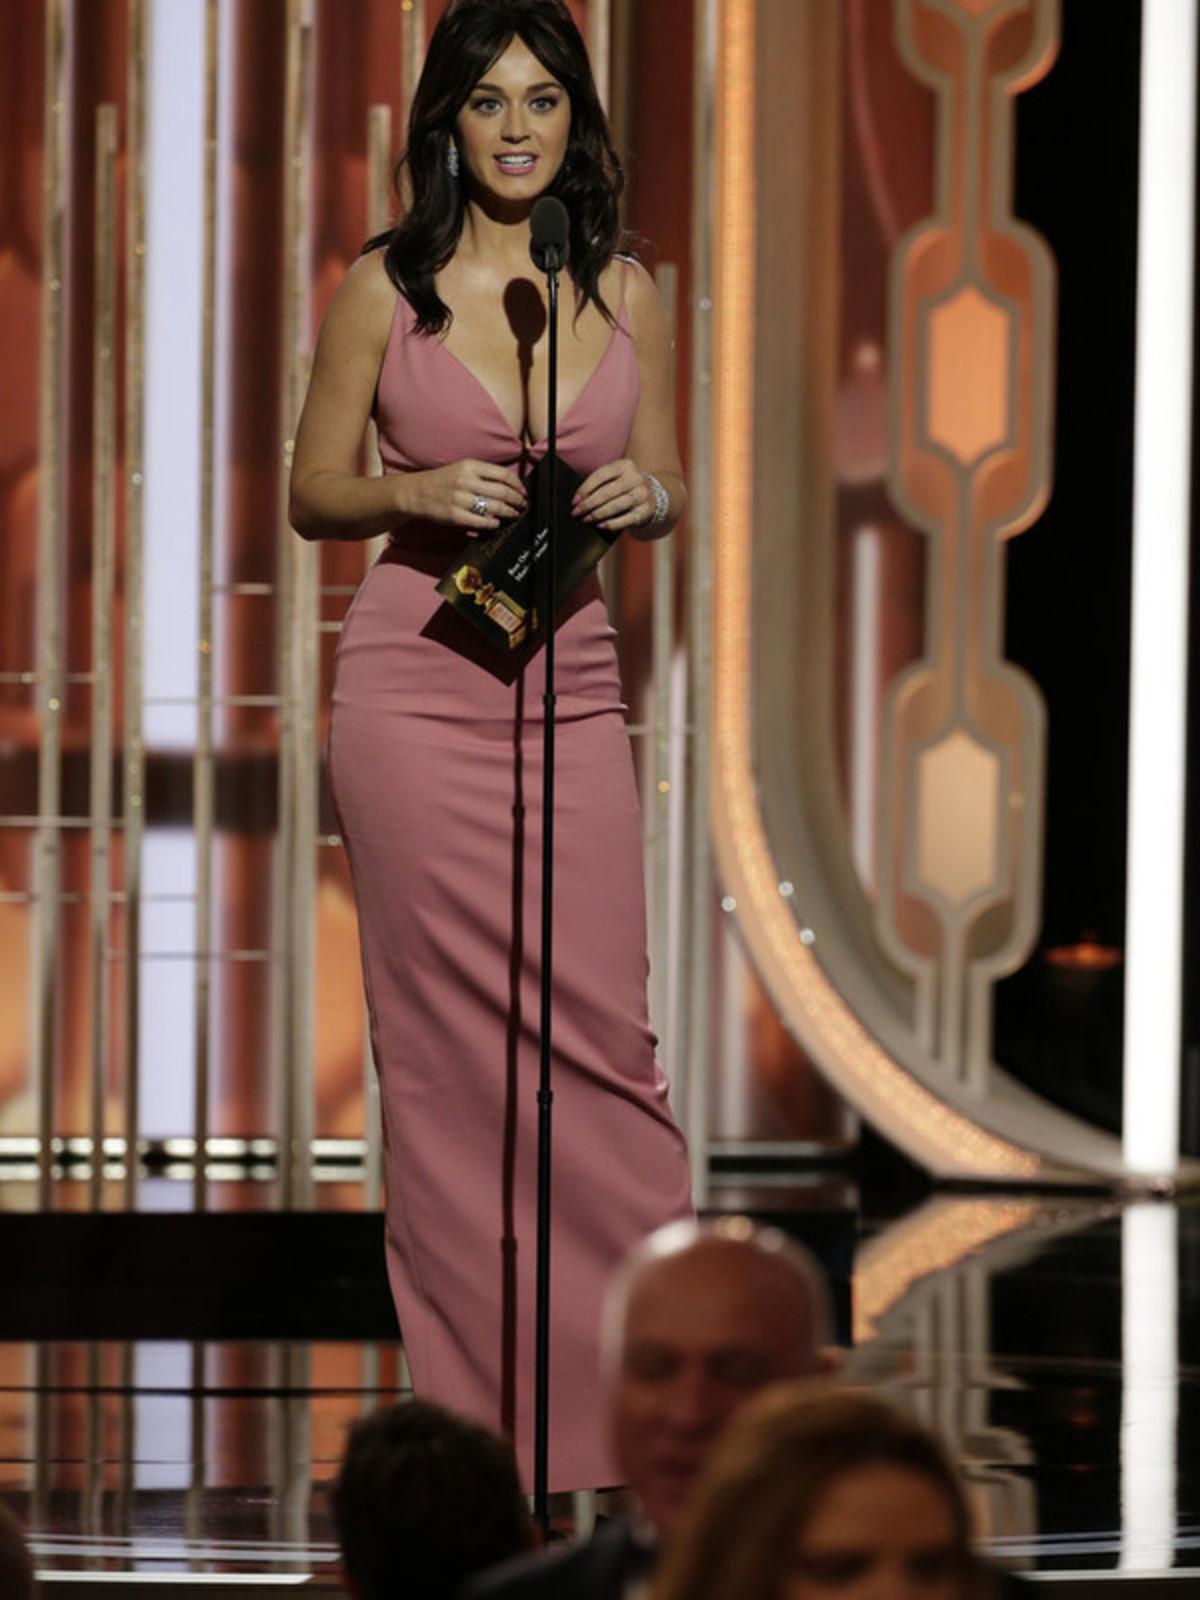 Katy Perry at Golden Globe Awards